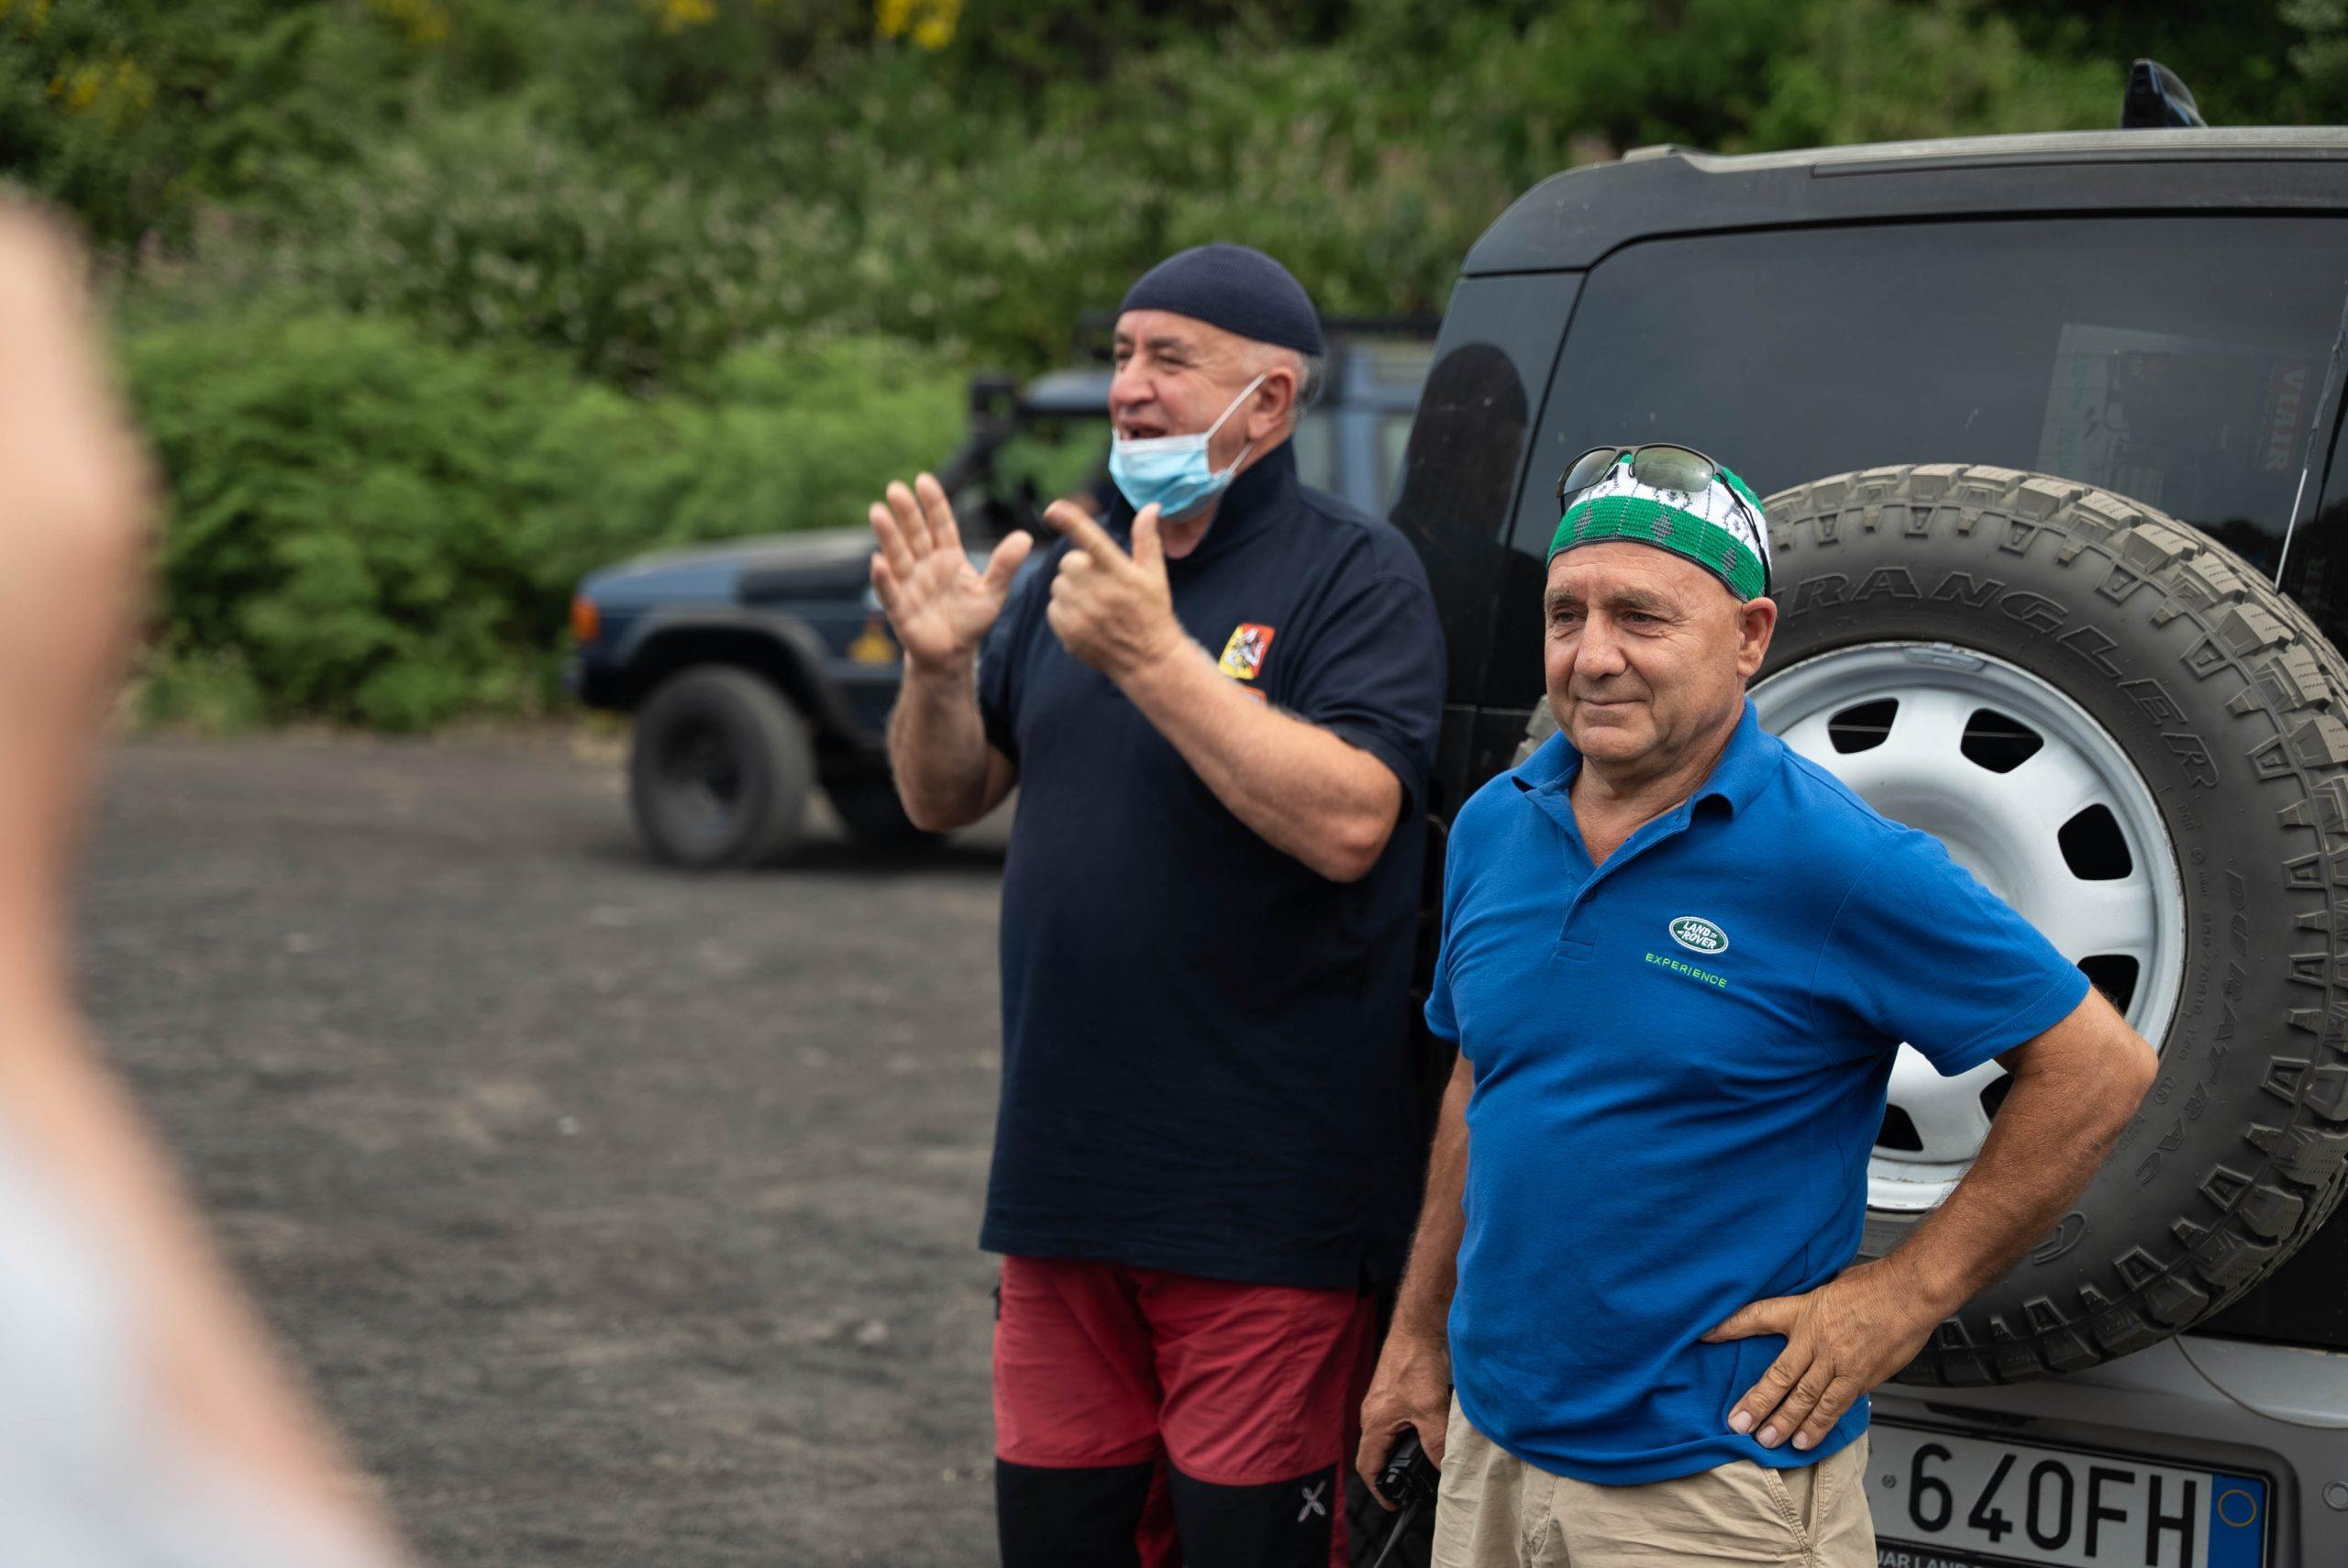 Land_Rover_Tour_Sicilia_2021_Land_Rover_Experience_Italia_-98